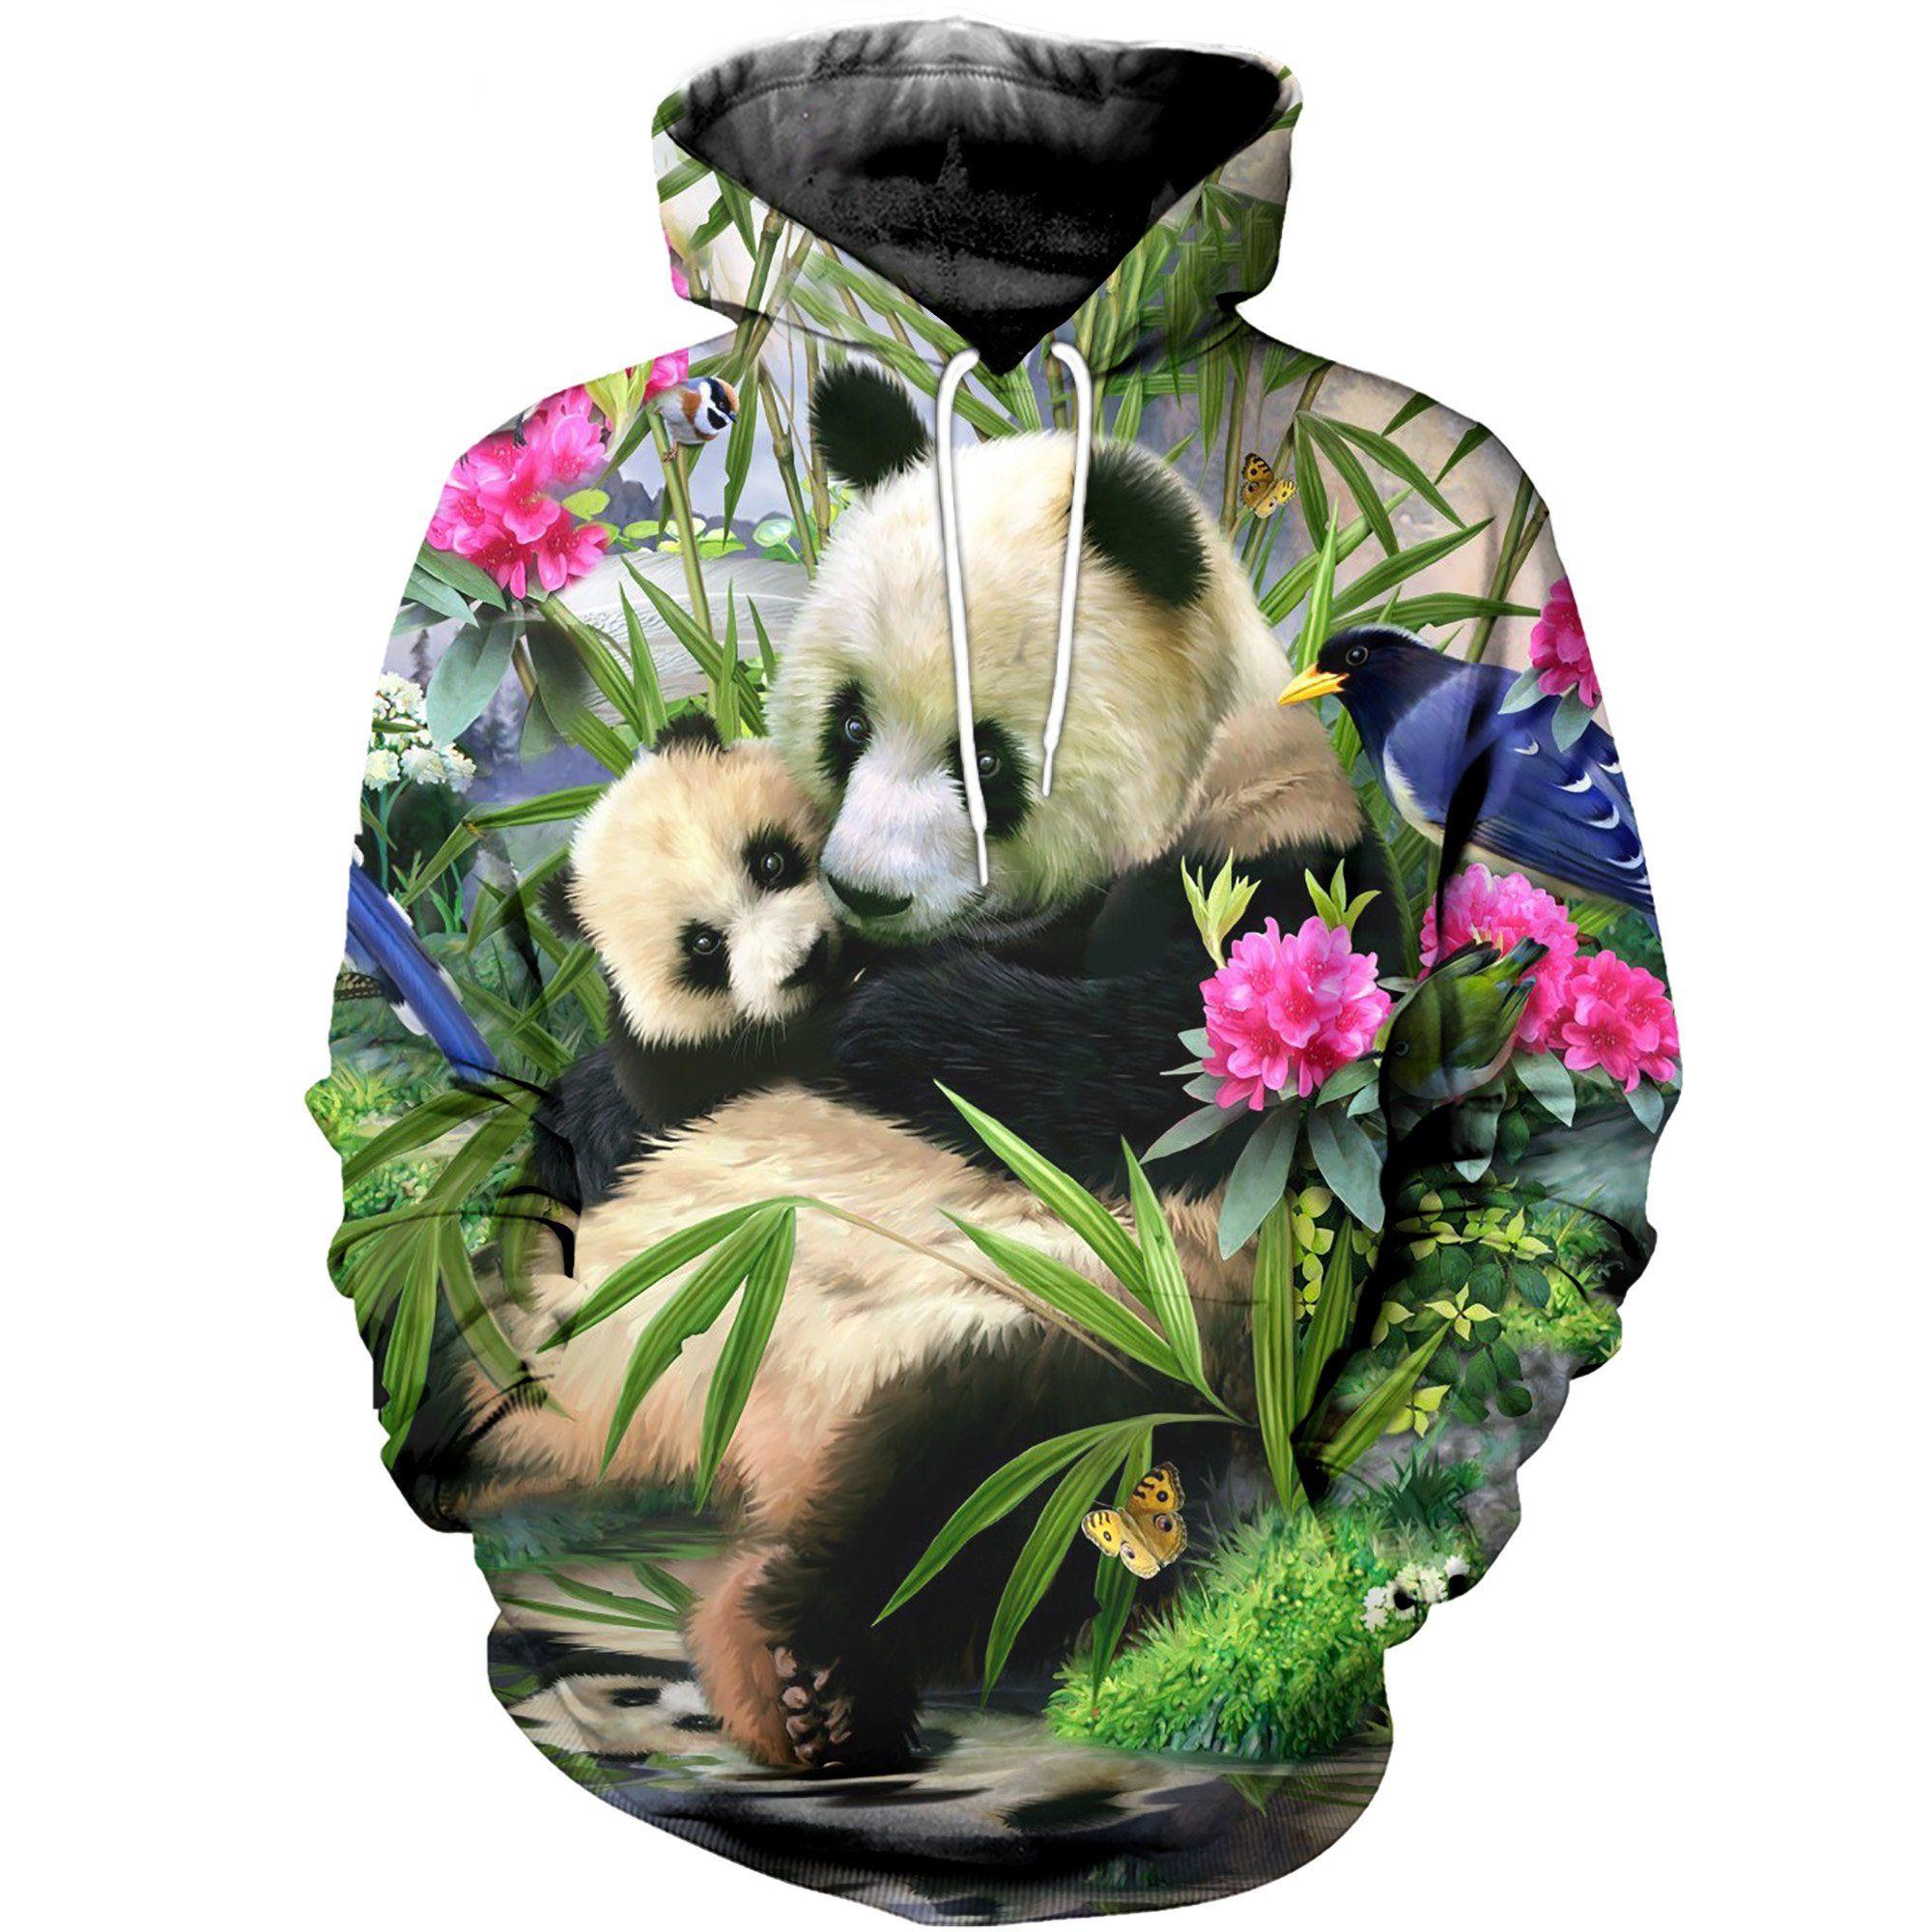 3D Printed Panda Flower Prints, Summer festival, Panda